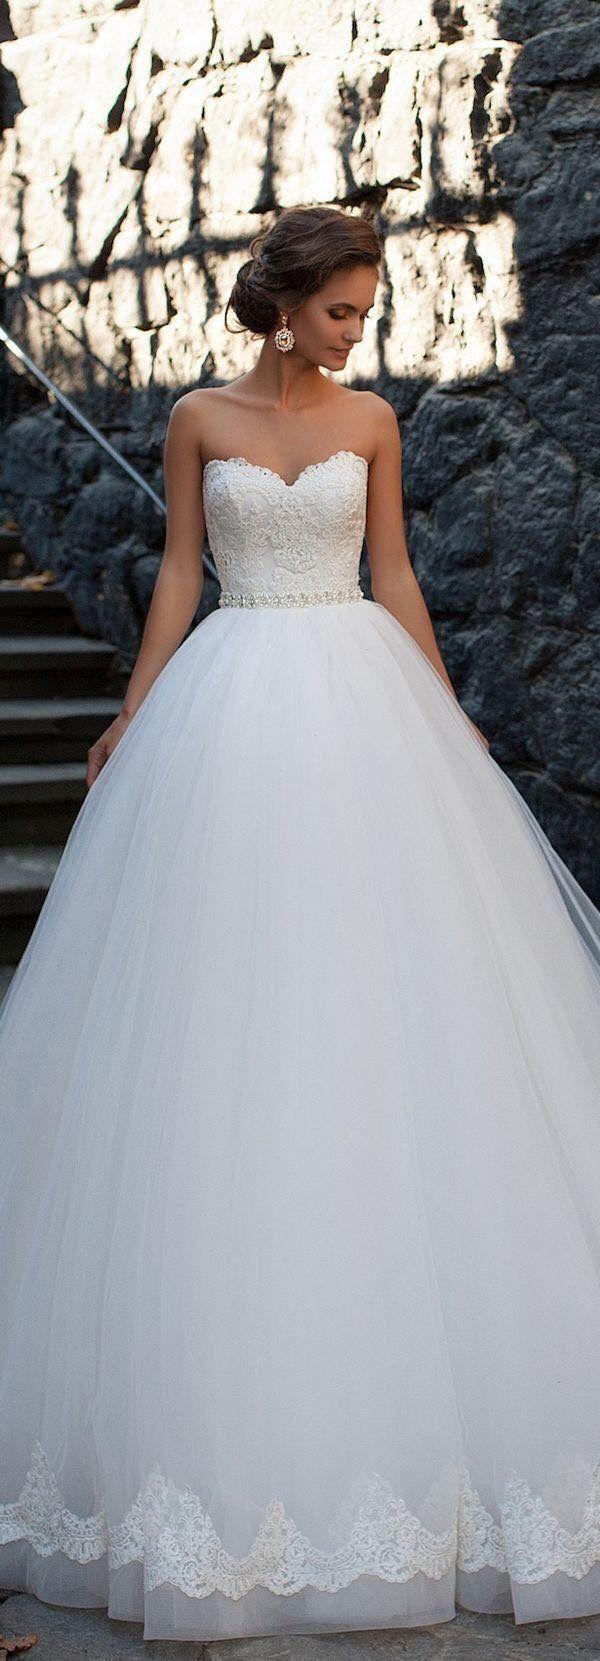 Pin by erika renteria on boda pinterest google wedding dress